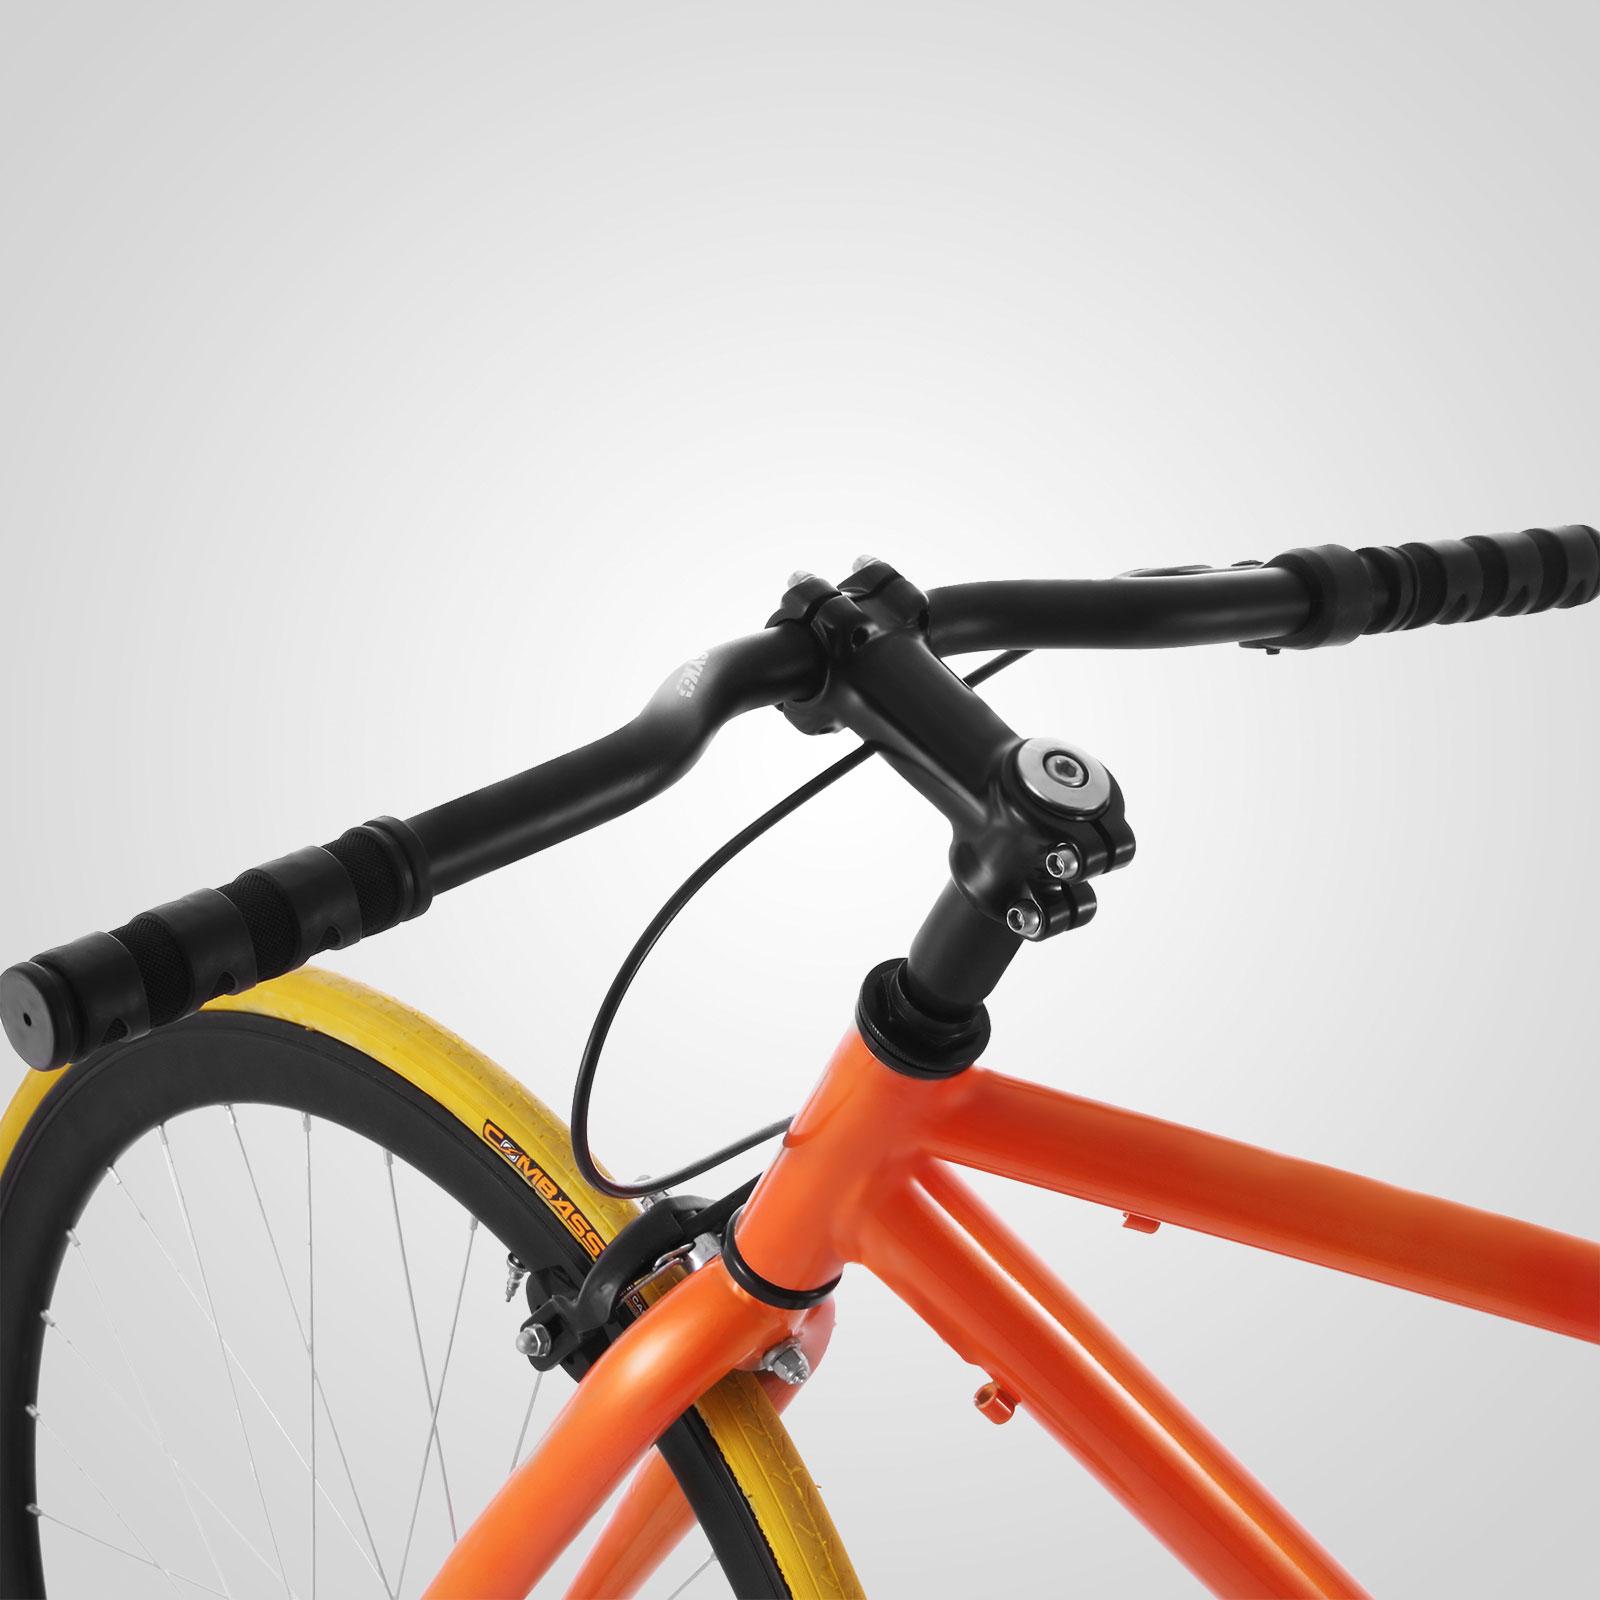 27 Quot Fixie Road Bike Fixie Bicycle Fixed Gear Bike Single